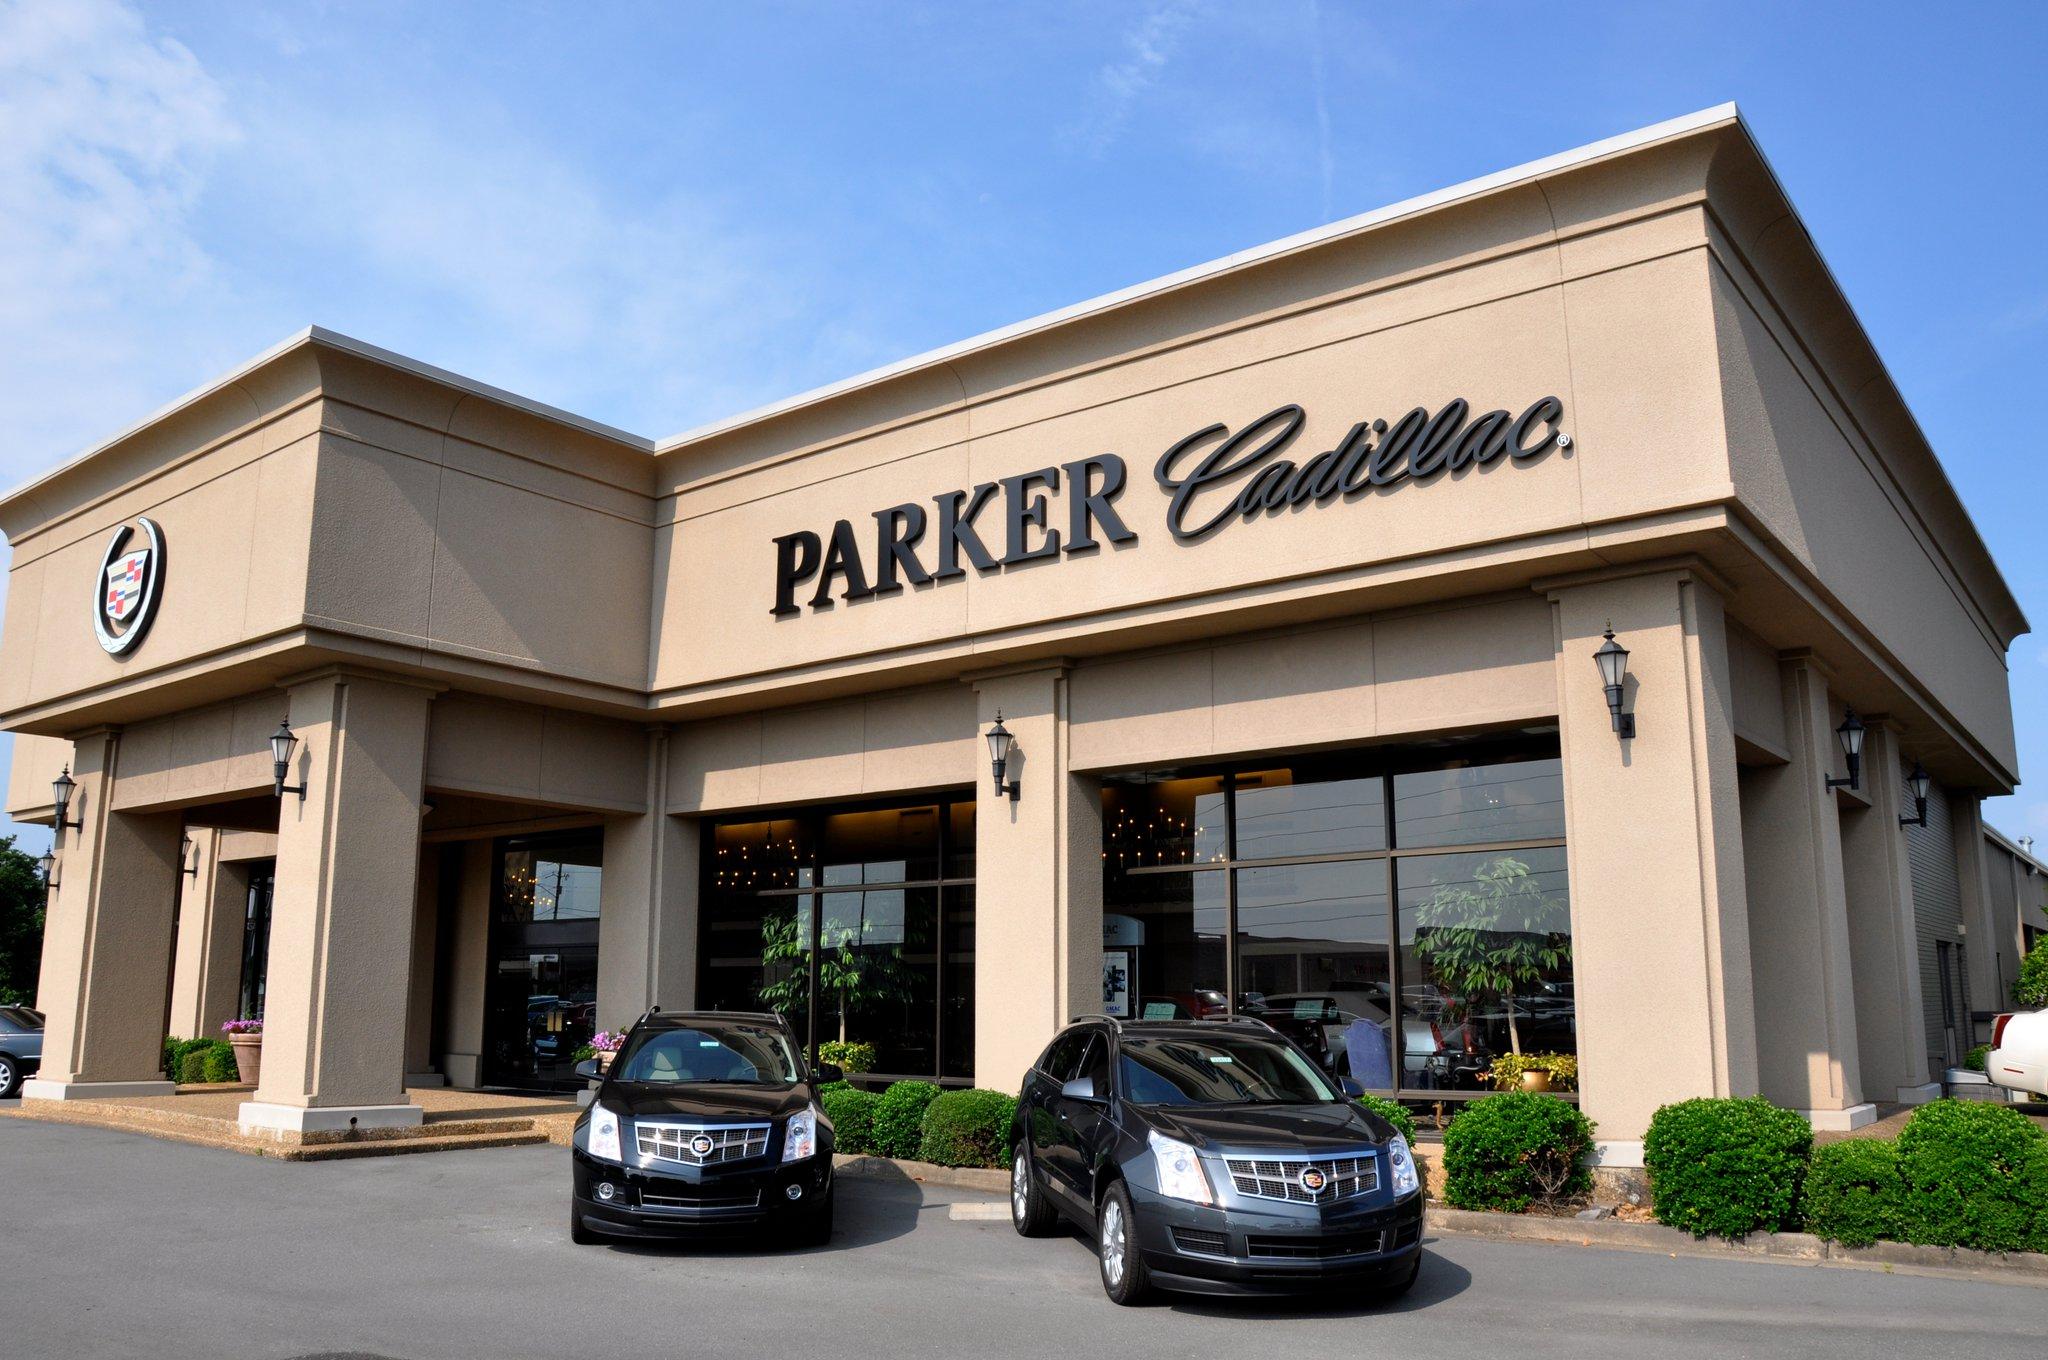 Parker Cadillac